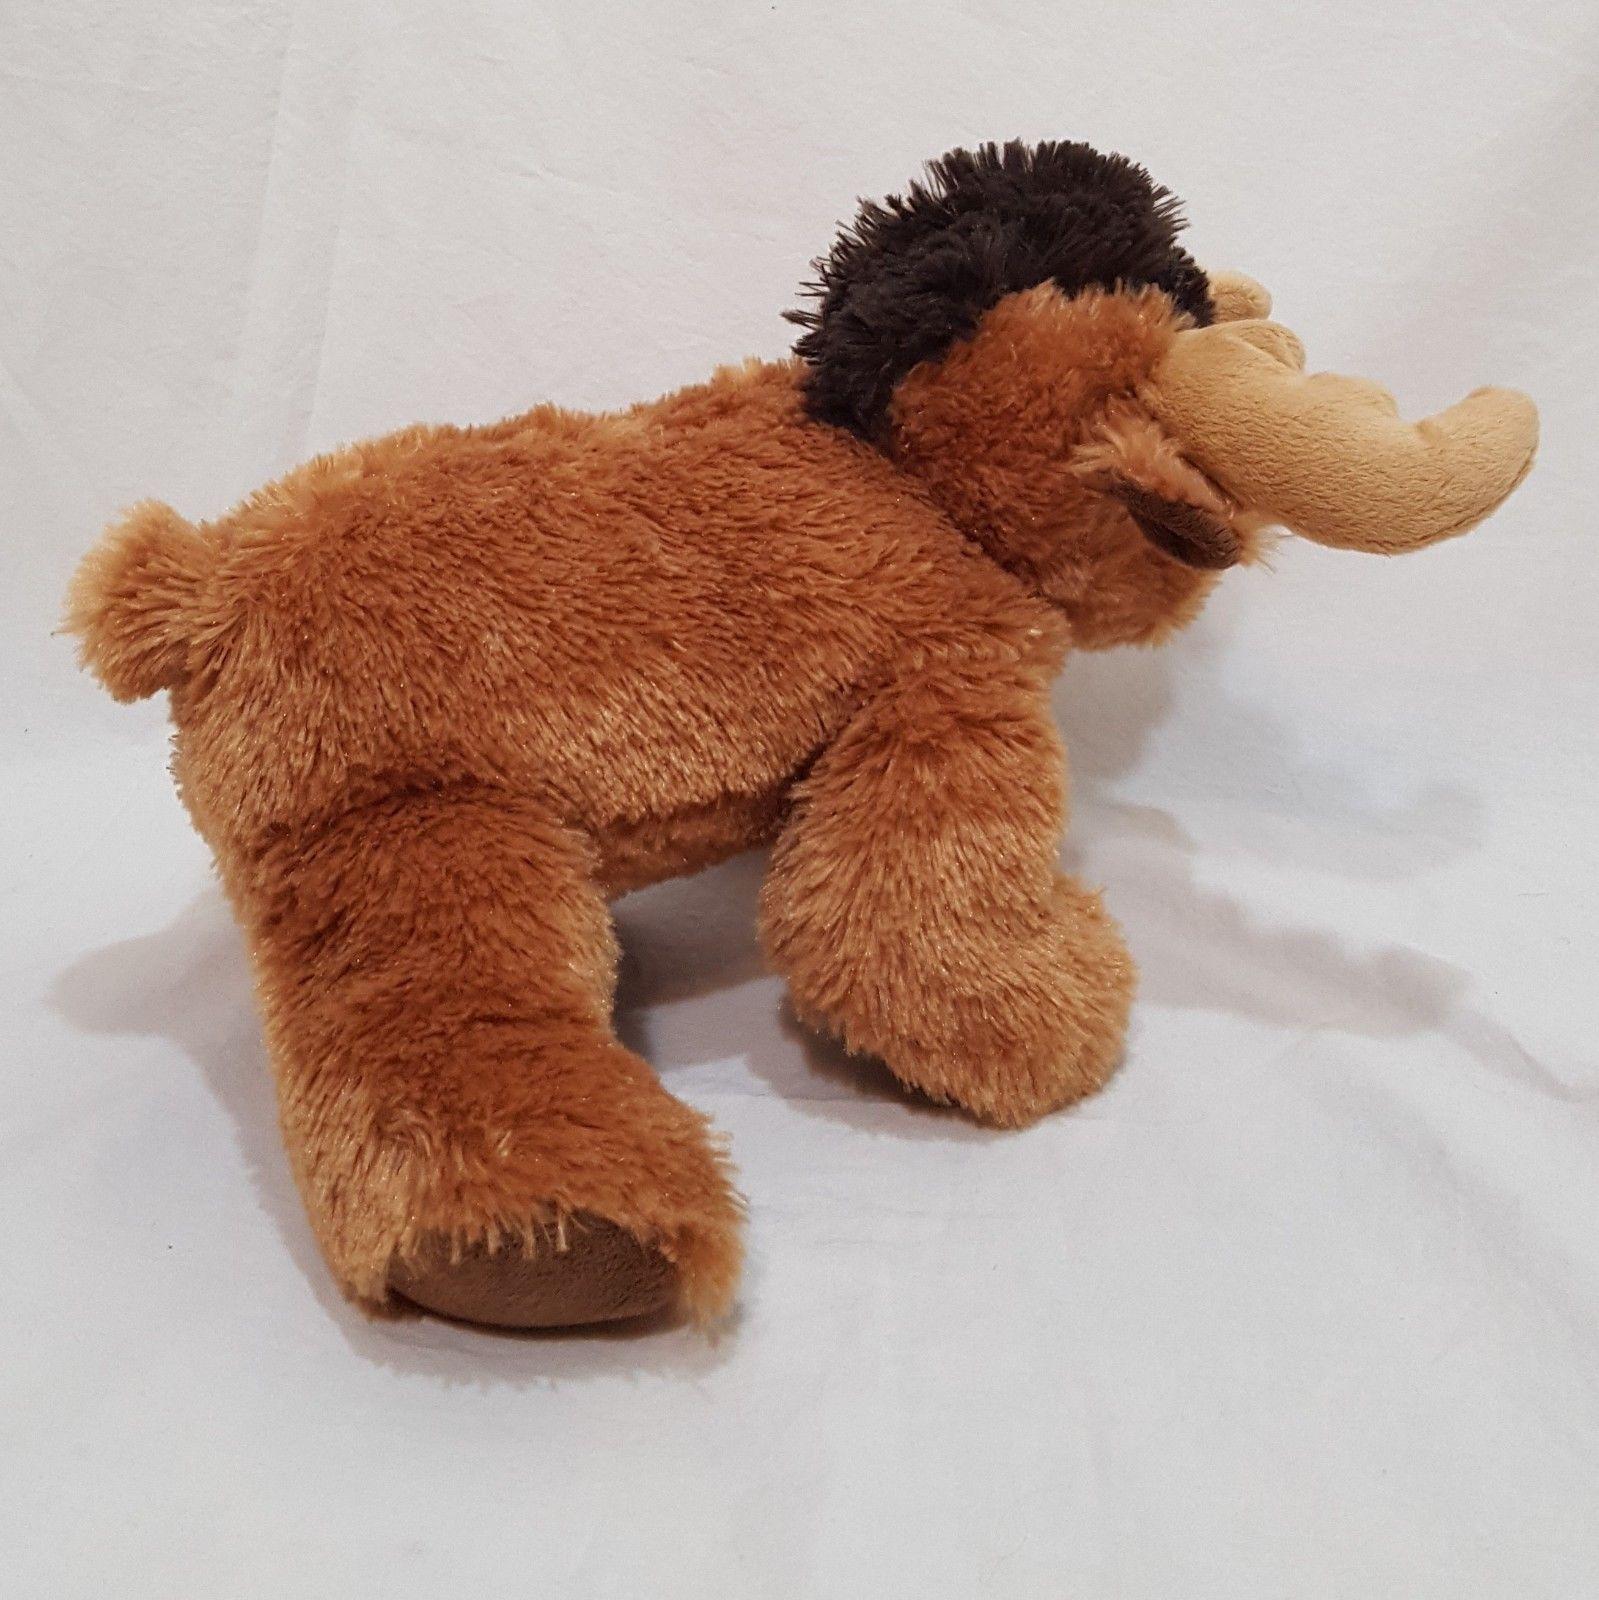 "Moose Brown Bean Bag Plush Stuffed Animal Toy 7"" Maple Leaf"